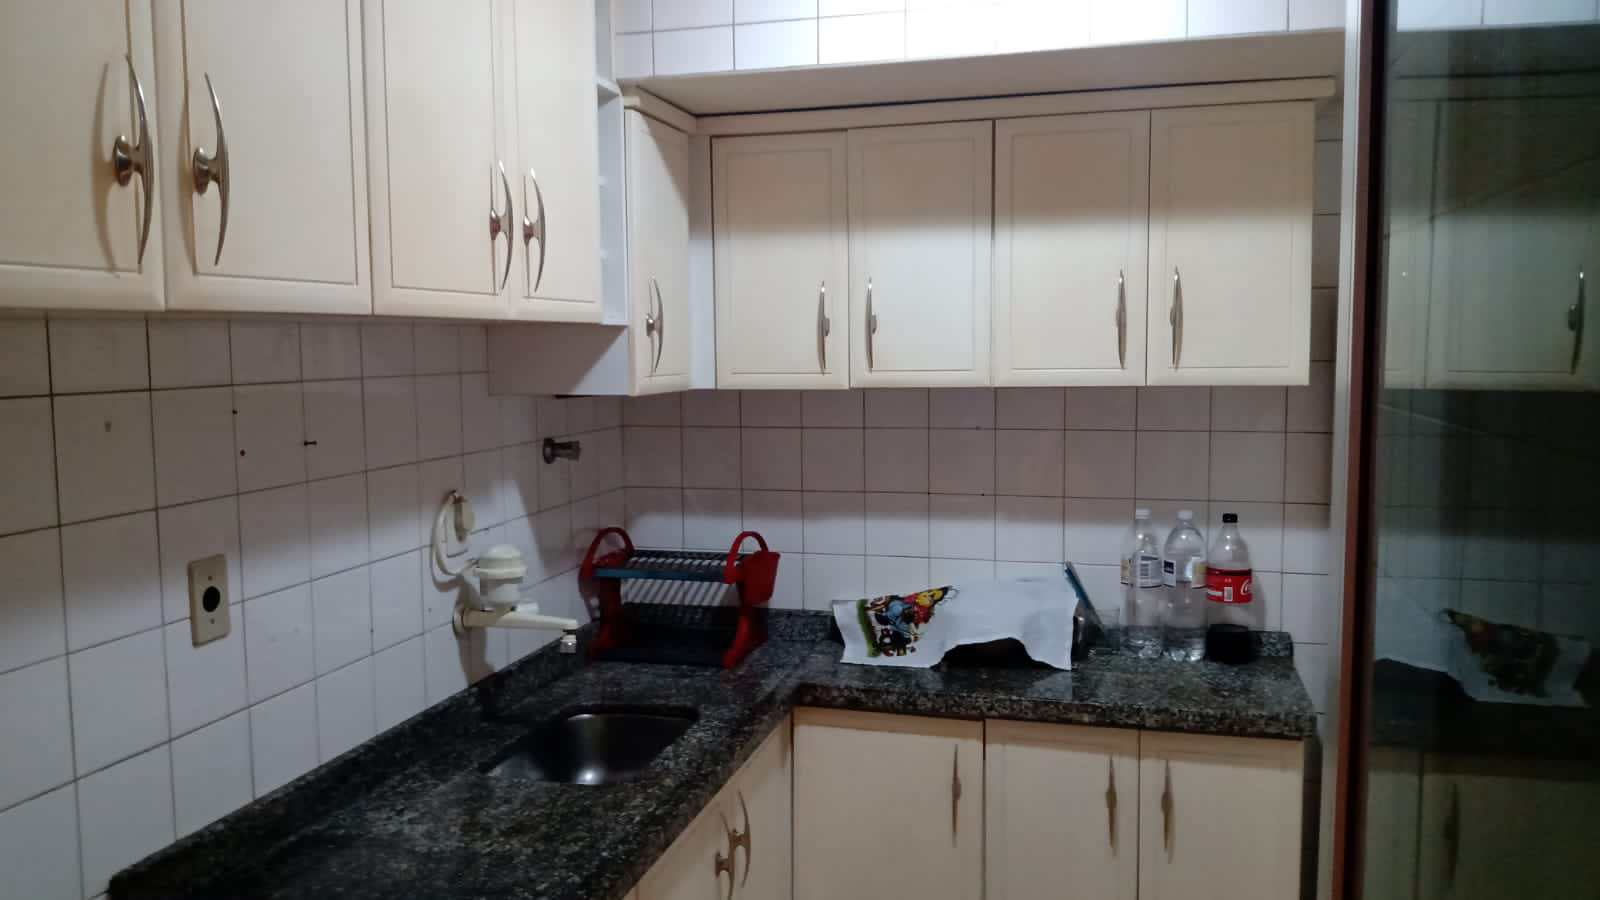 Apartamento com 2 dorms, Jardim Parque Morumbi, São Paulo - R$ 260 mil, Cod: 18559